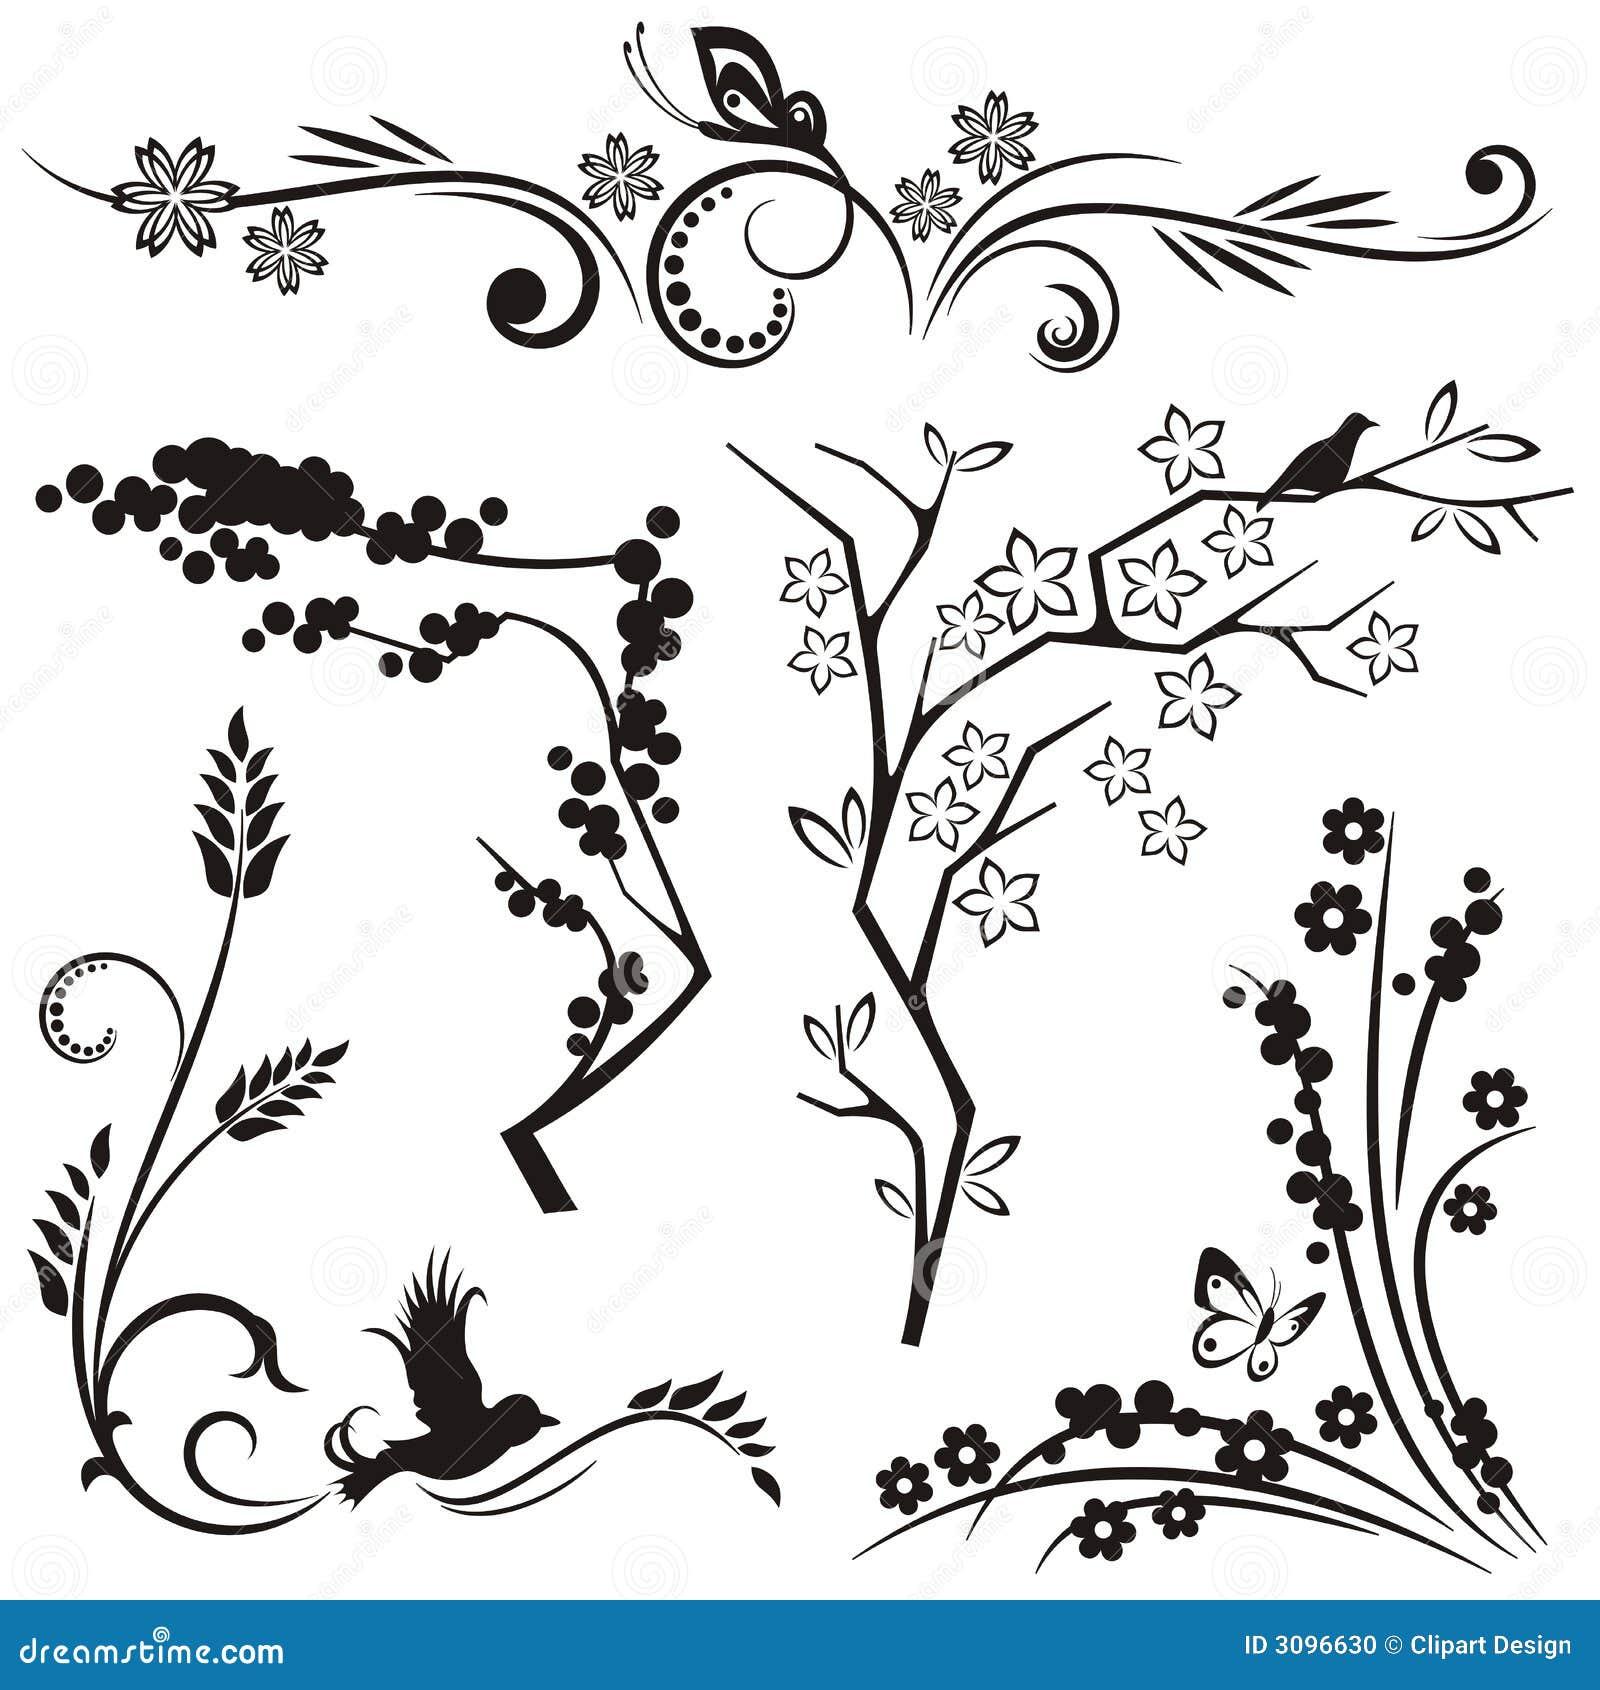 Japanese floral design series